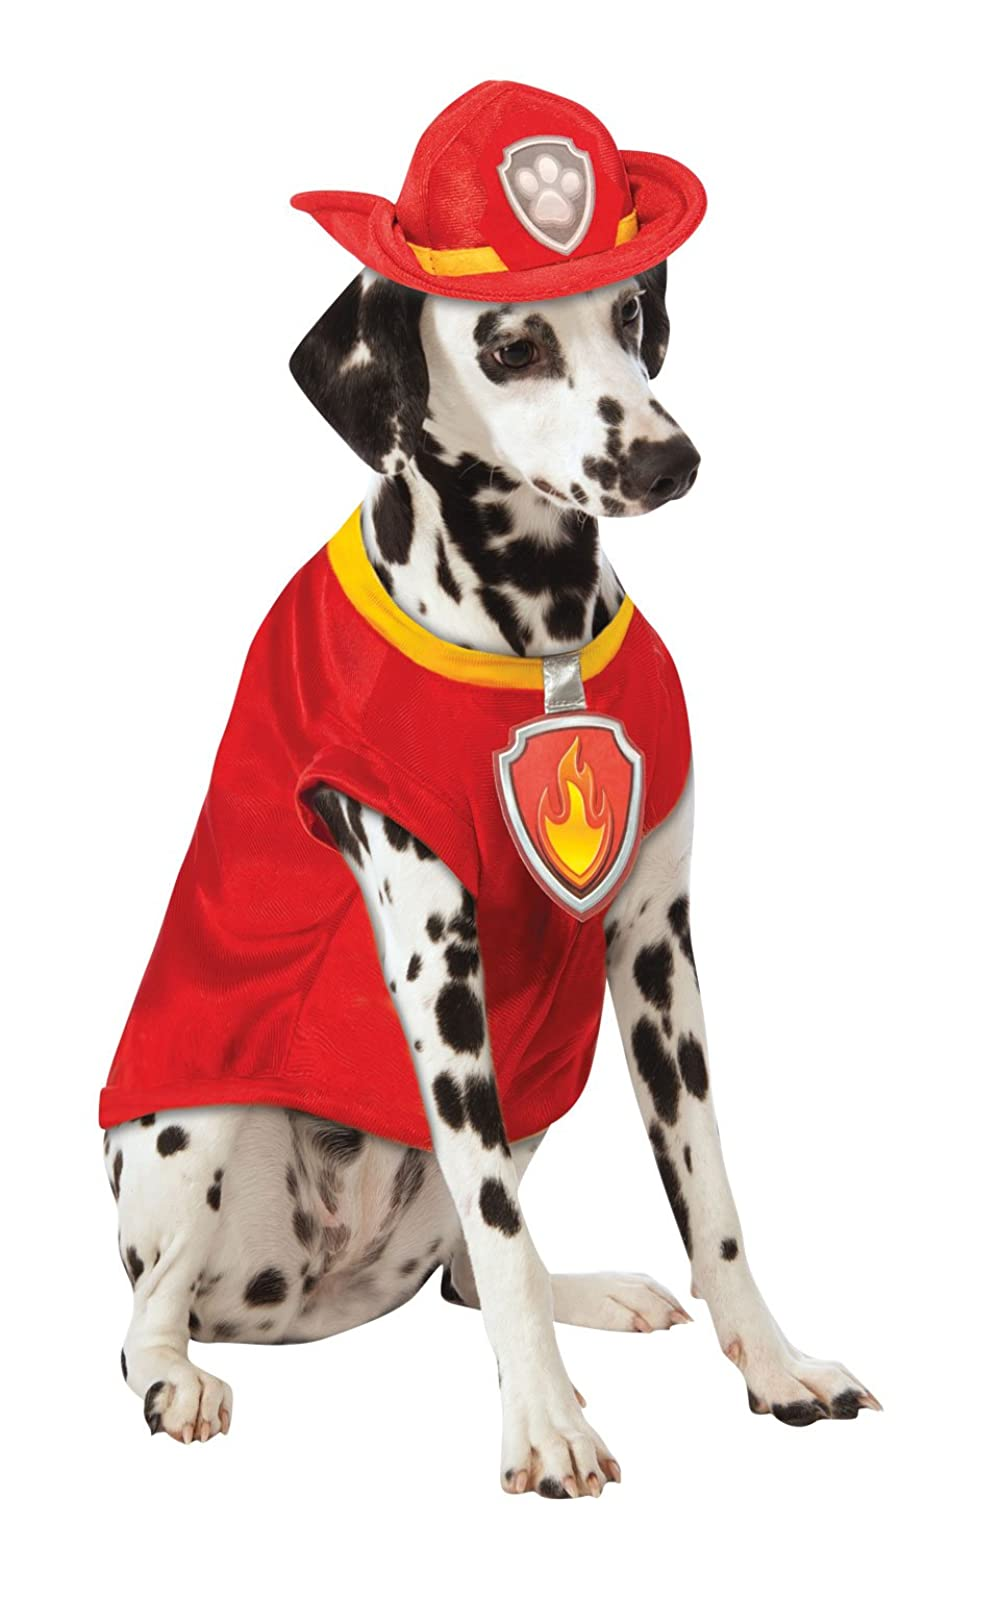 Paw Patrol Marshall Dog Costume 580211 XL Marshall - 3